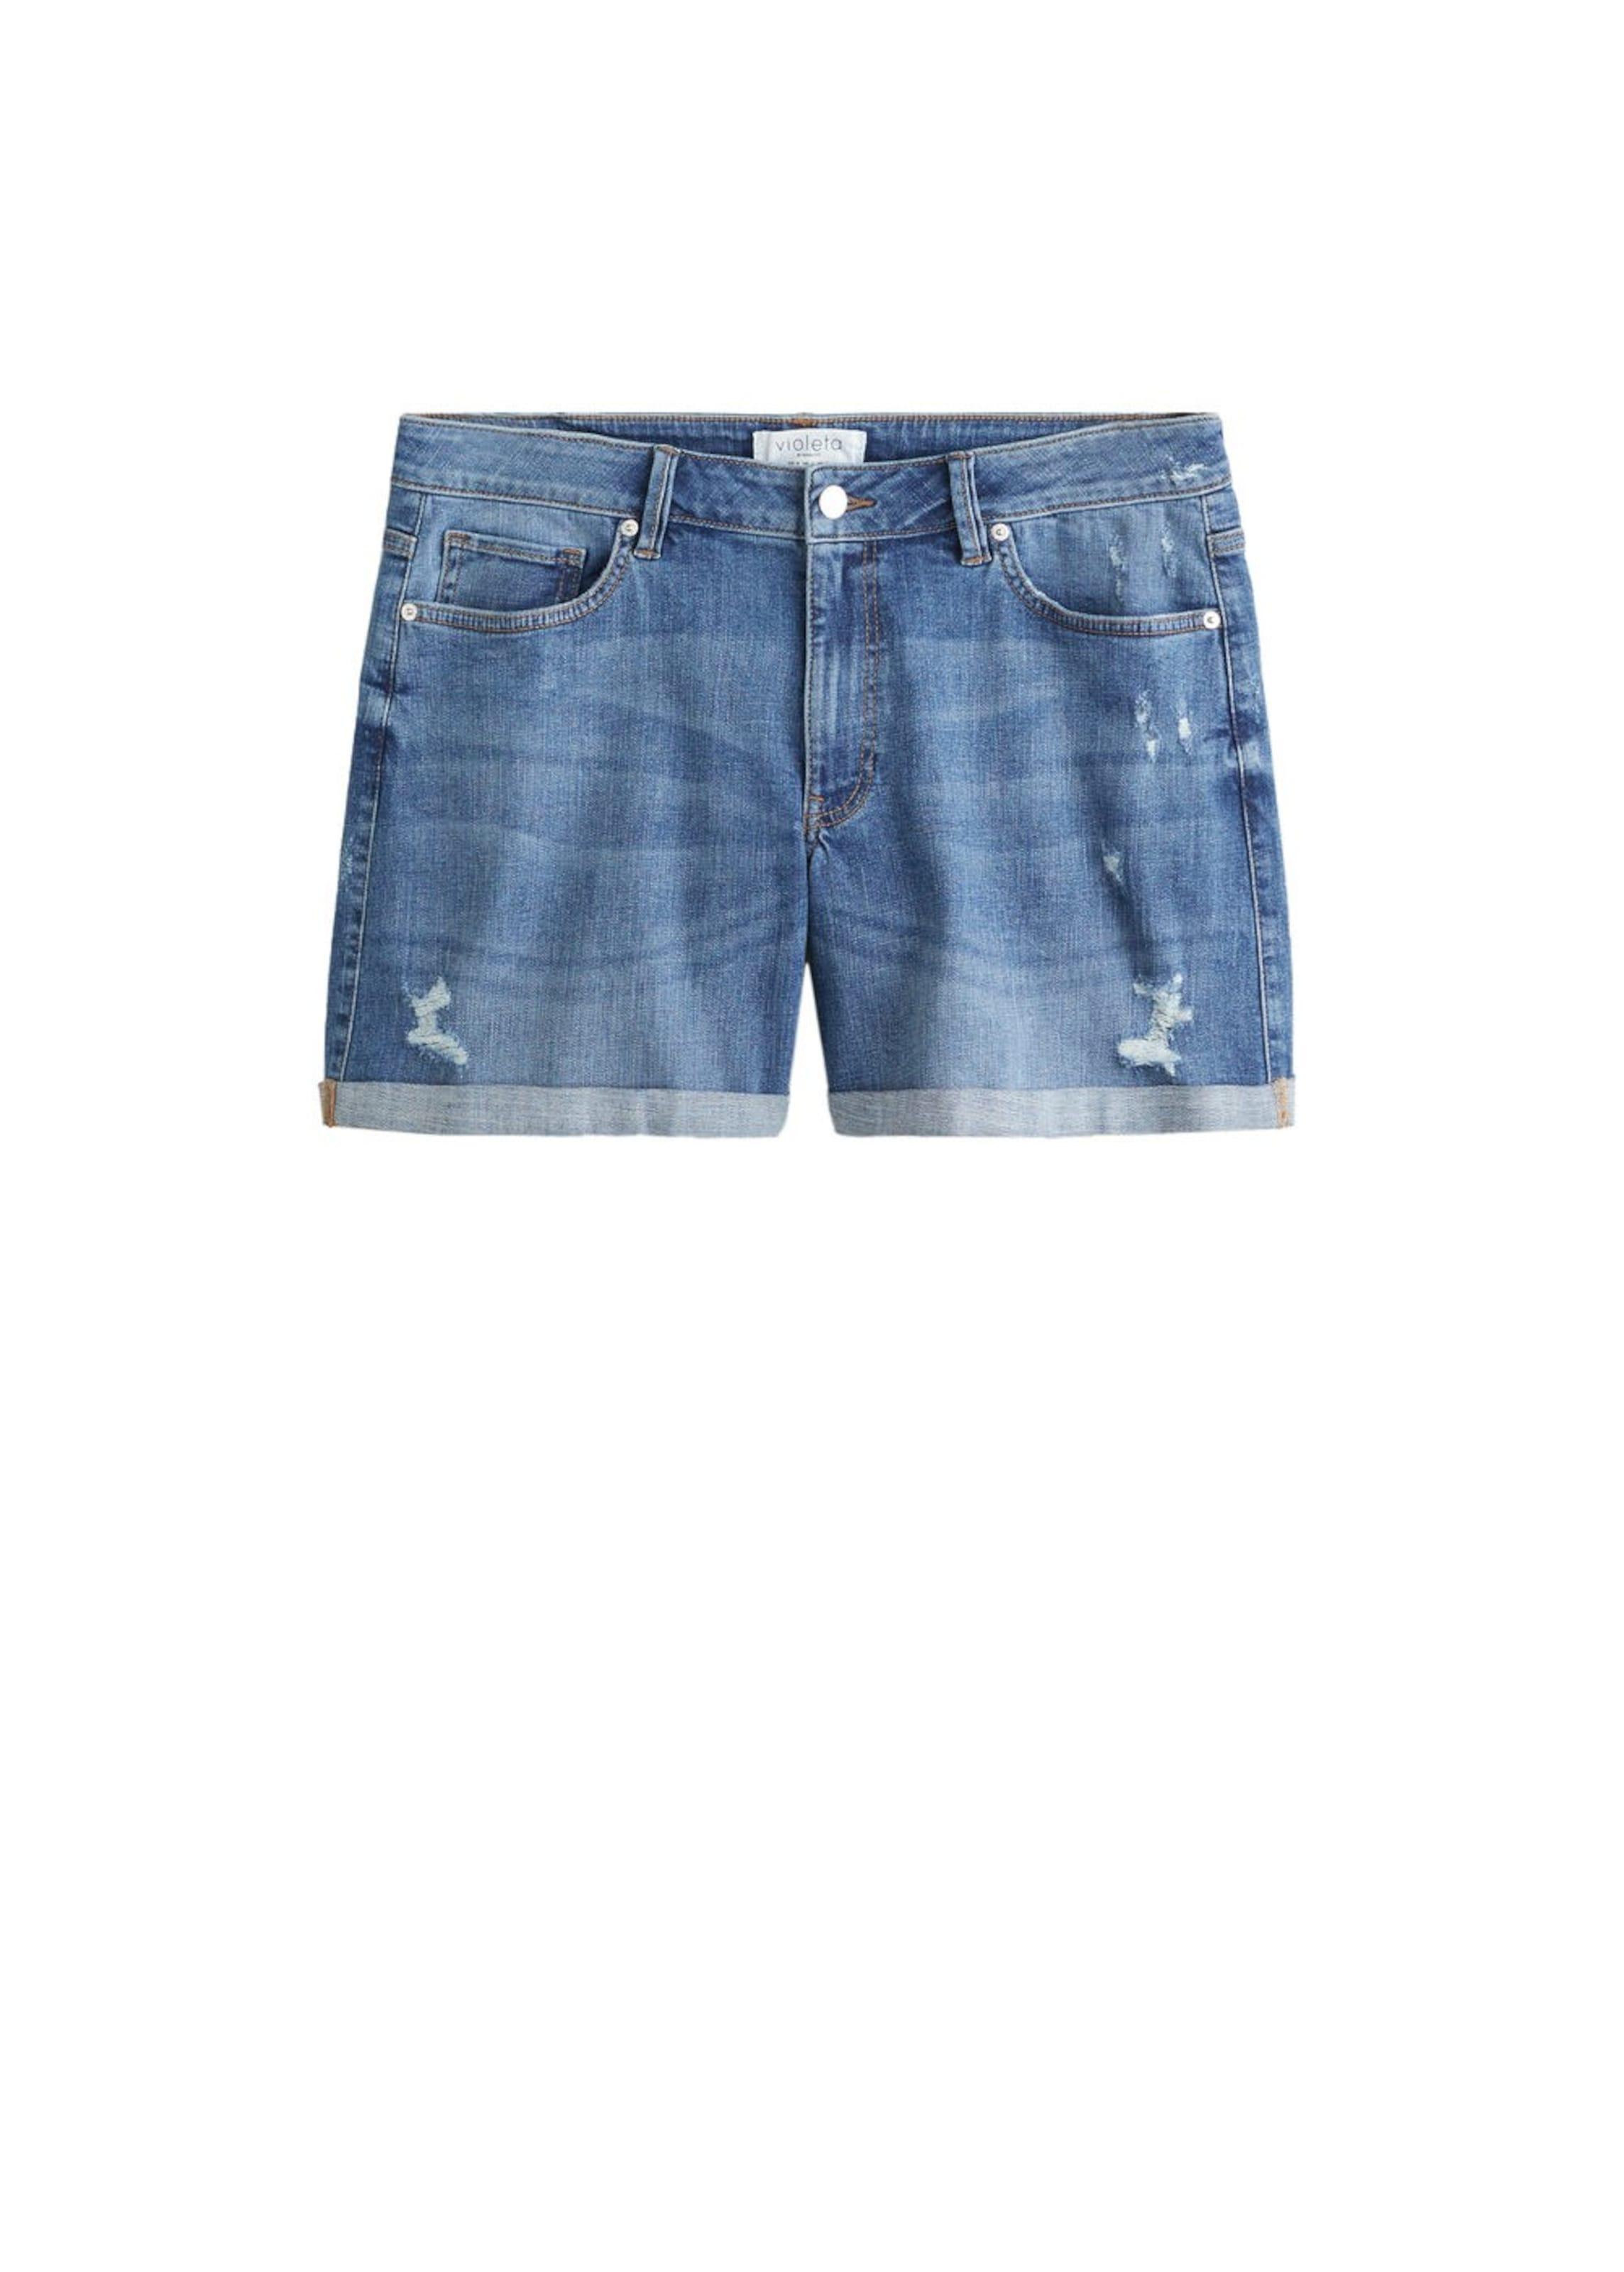 'vicky' Blue Denim Shorts By Violeta In Mango vNn80mOw